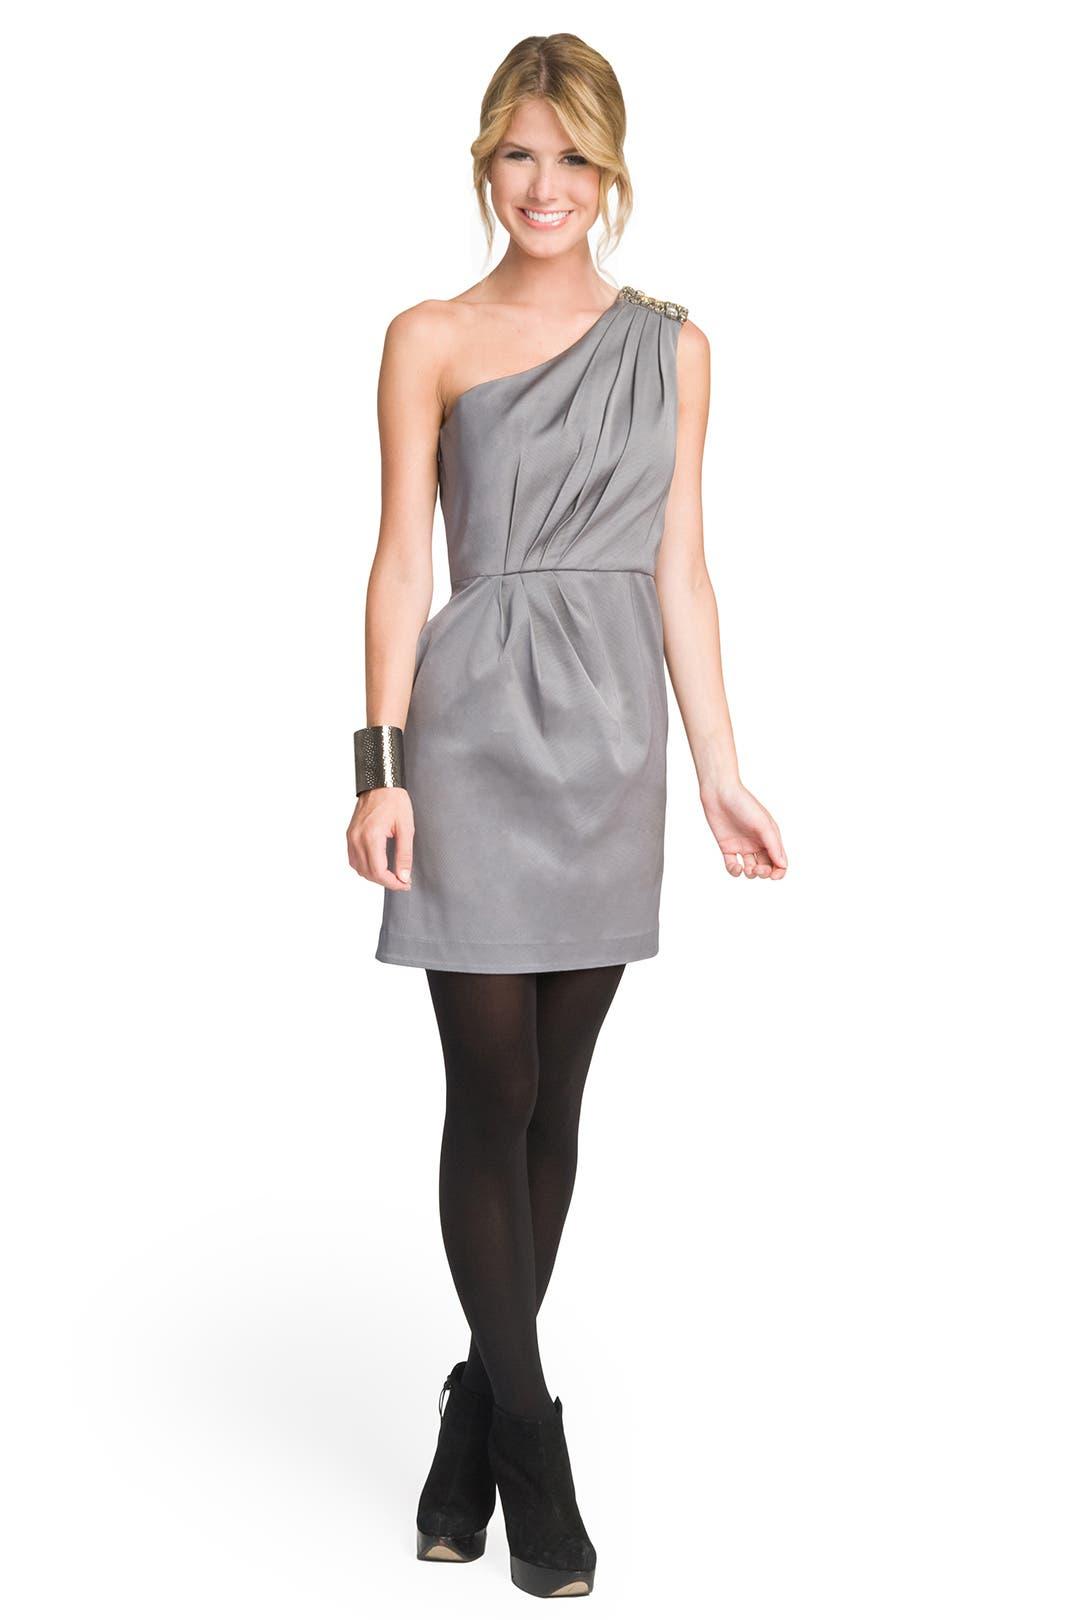 Silver Sensation One Shoulder Dress by Shoshanna